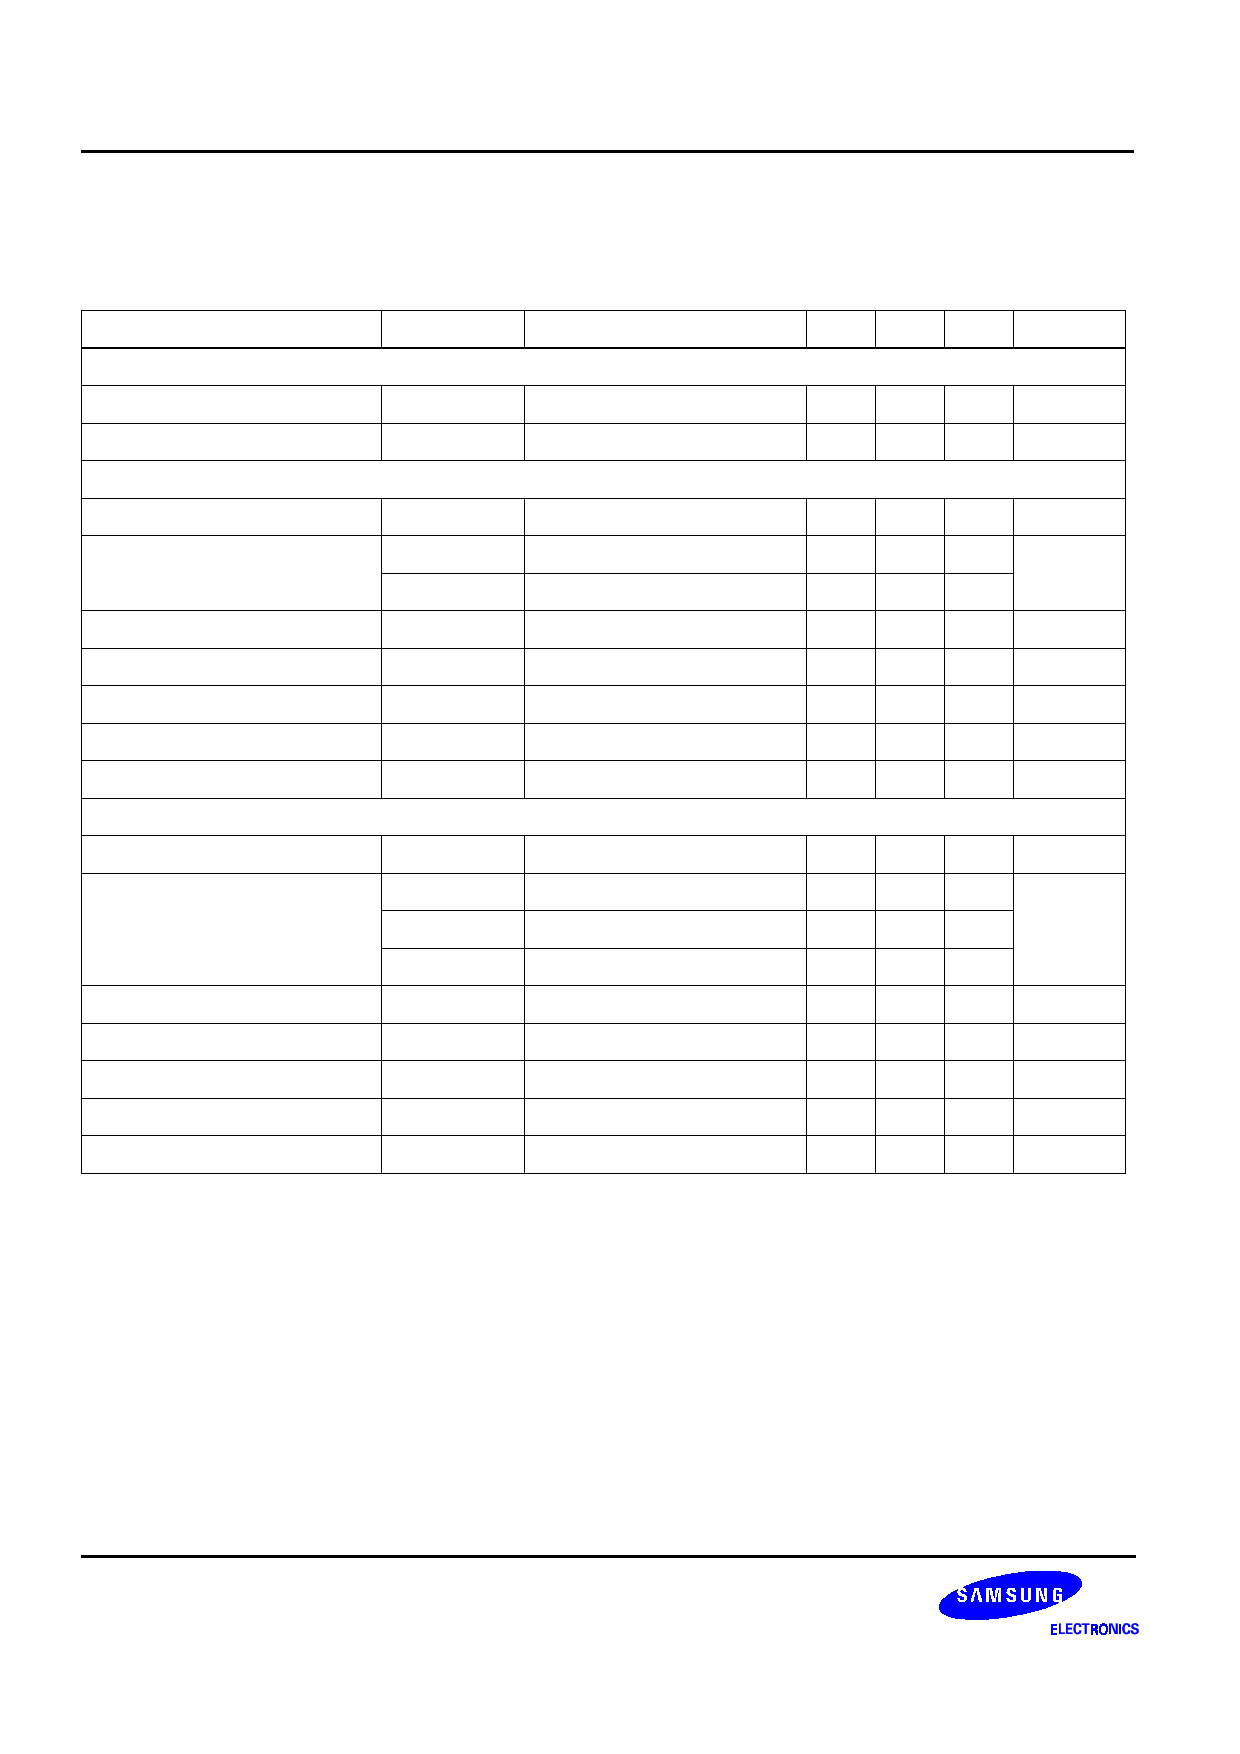 S1T8507C01-D0B0 pdf, 반도체, 판매, 대치품